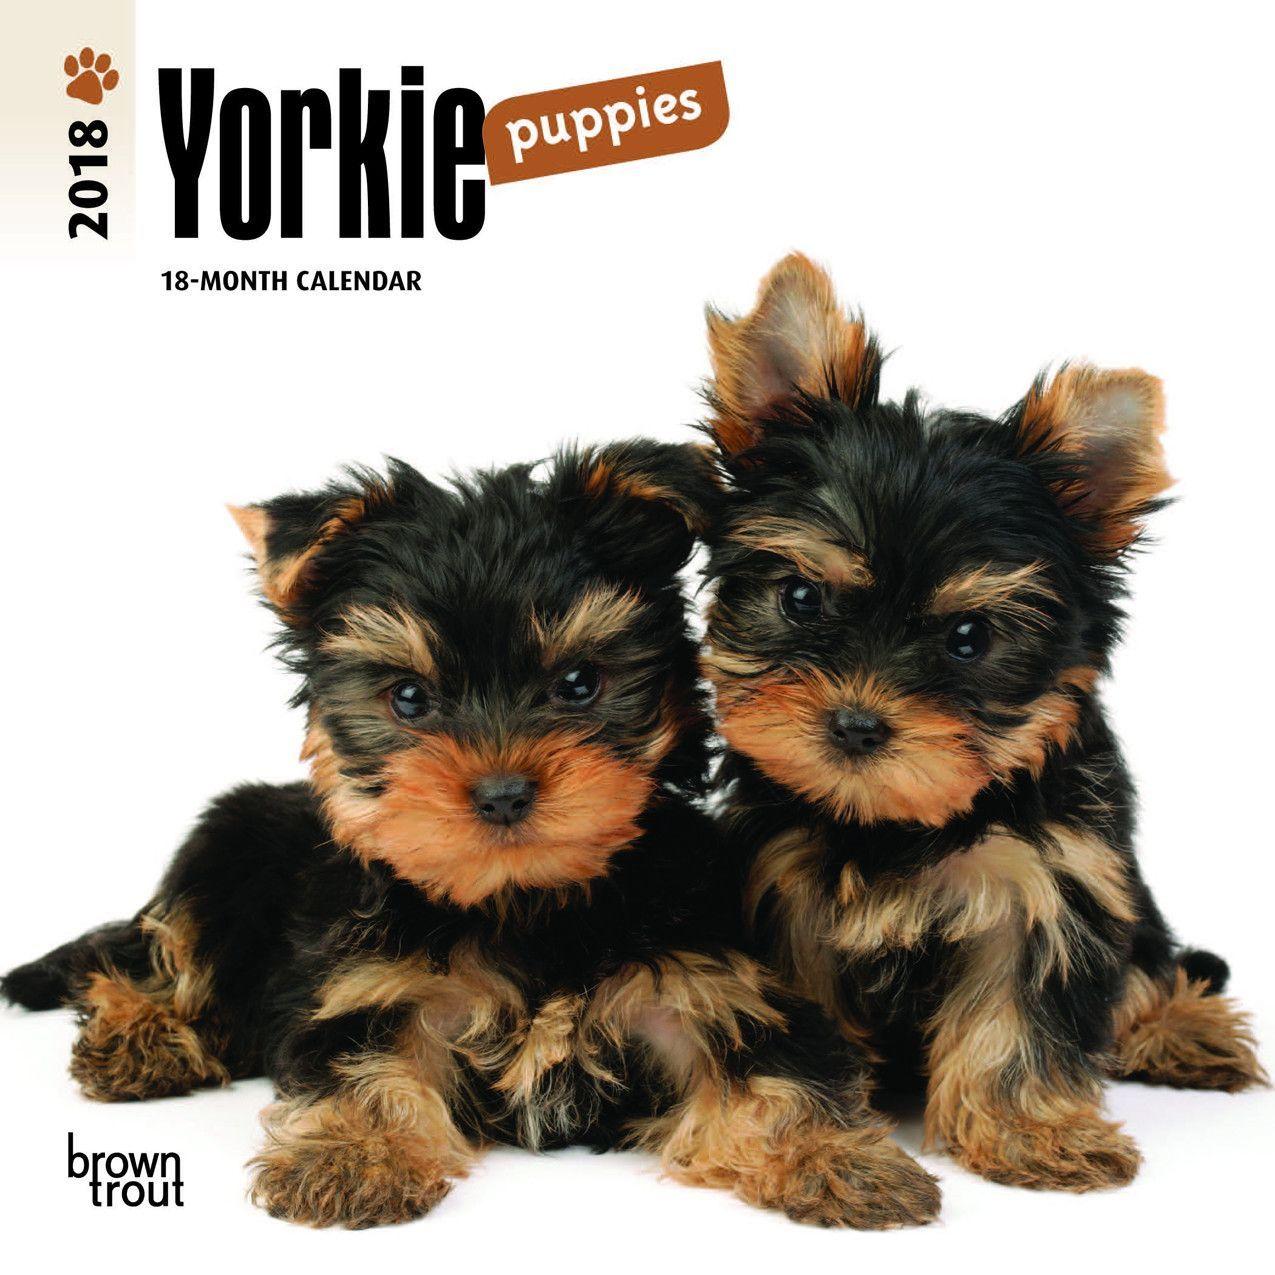 Yorkie Puppies 2018 Mini Wall Calendar Terrier Puppies Yorkshire Terrier Yorkshire Terrier Puppies